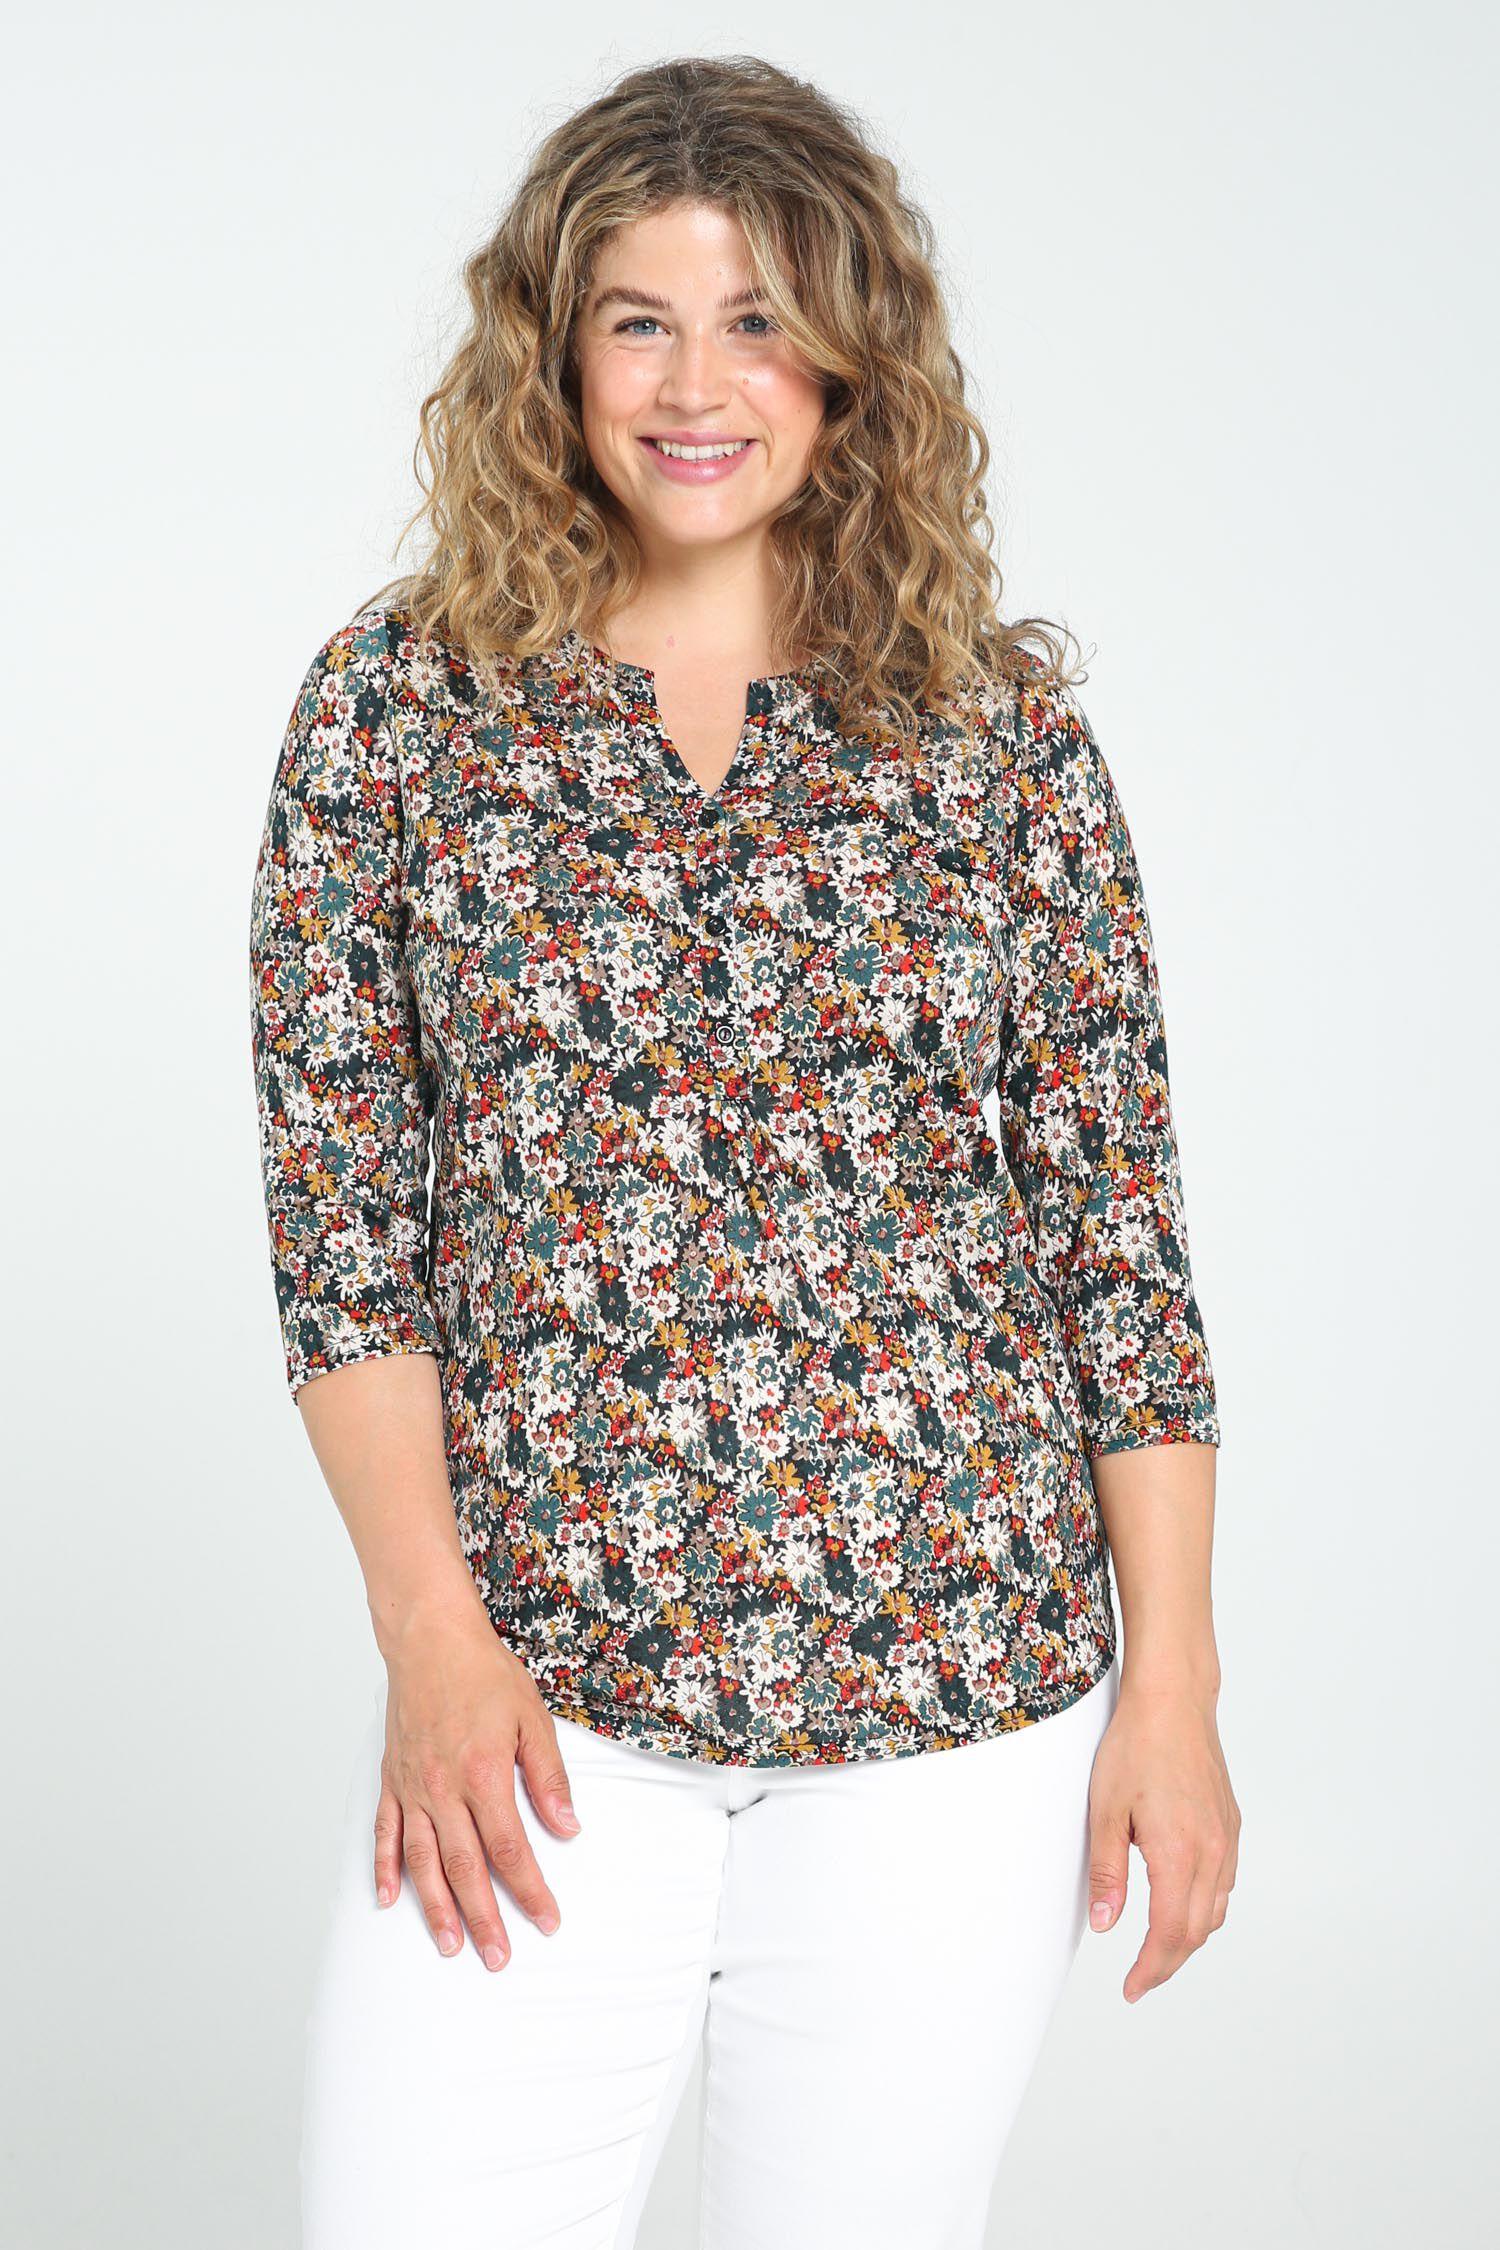 paprika -  Print-Shirt mit breitem Rundhals, casual Naturfarbe aus Viskose